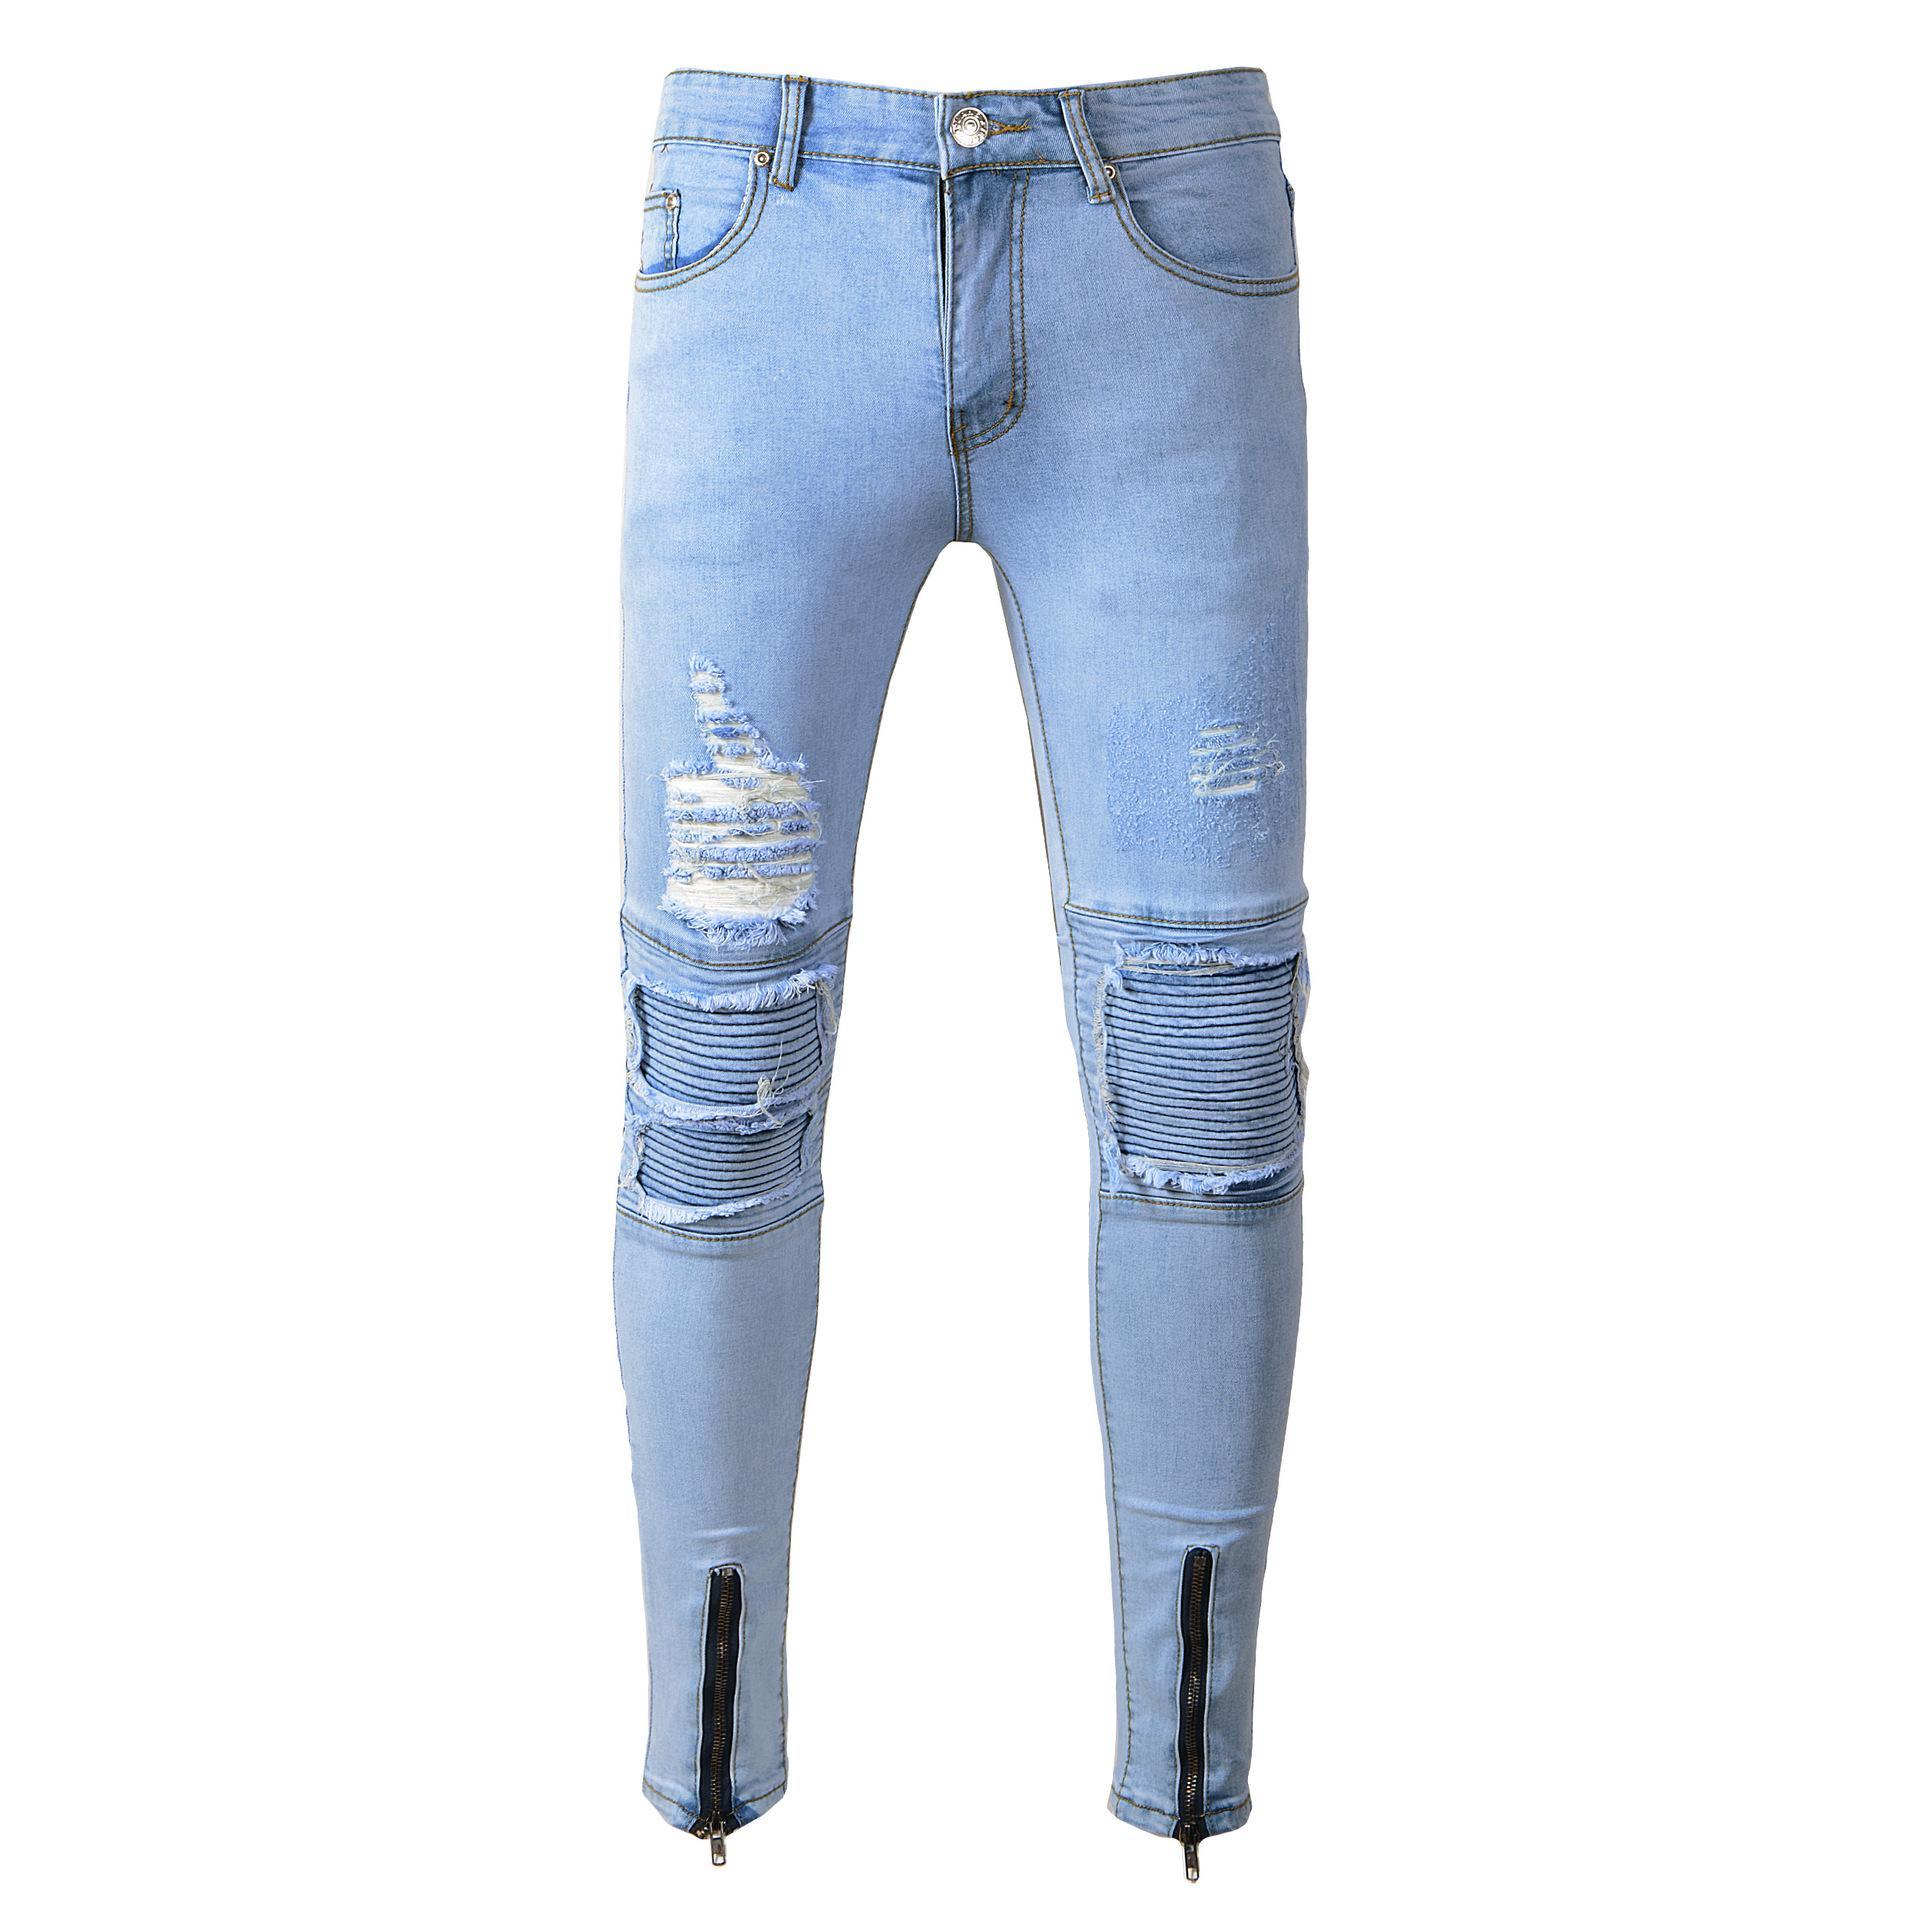 d2f359af88 Moda Uomo Slim Fit Hole Biker Jeans Light -Colore Matita Lavato Pantaloni  Strappato Jeans Denim Distrutti Hip Hop Streetwear Blu